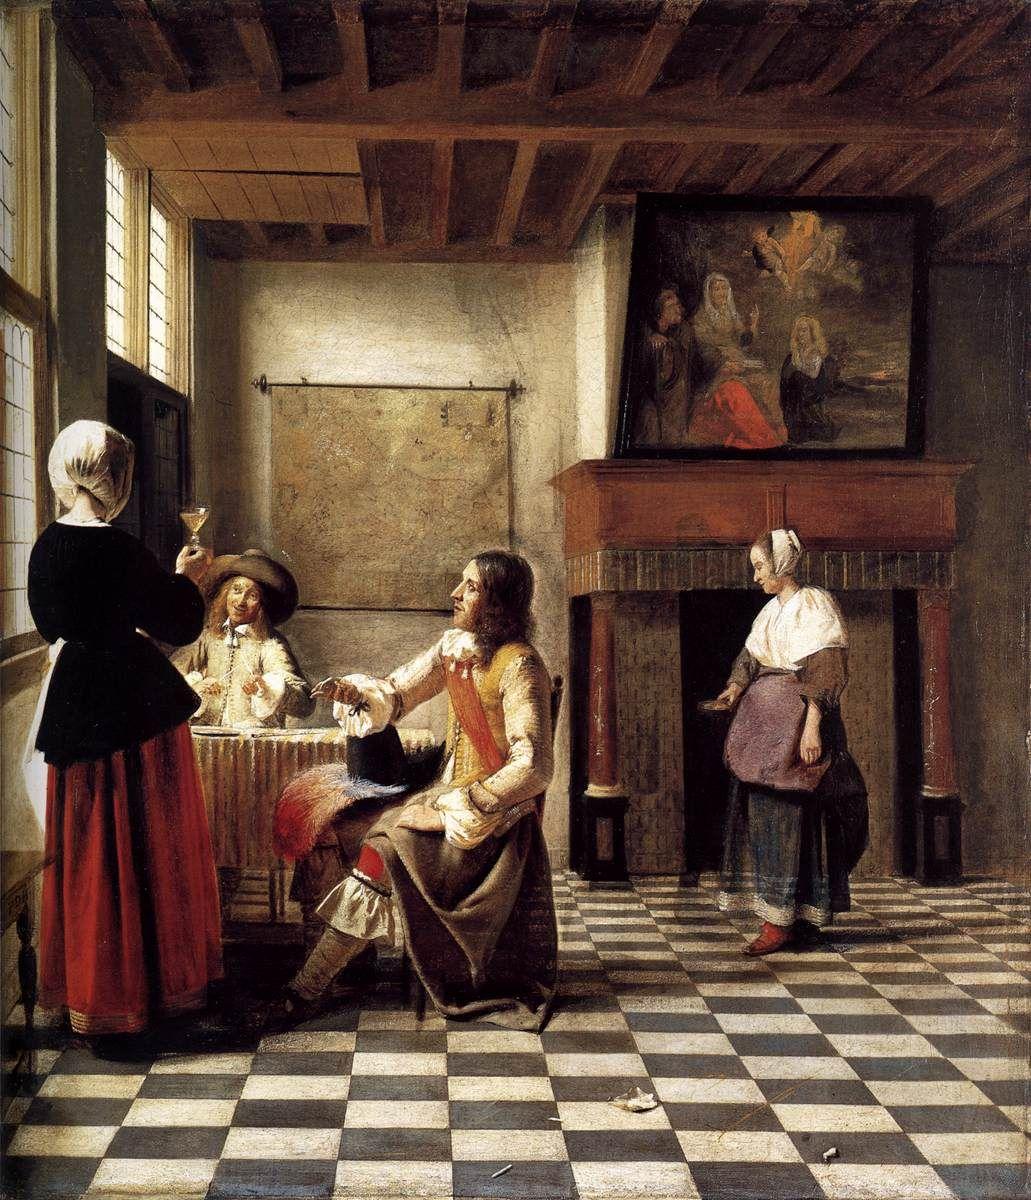 A Woman Drinking with Two Men, 1658, Pieter De Hooch . http://www.lib-art.com/artgallery/30553-a-woman-drinking-with-two-men-hooch-pieter-de.html